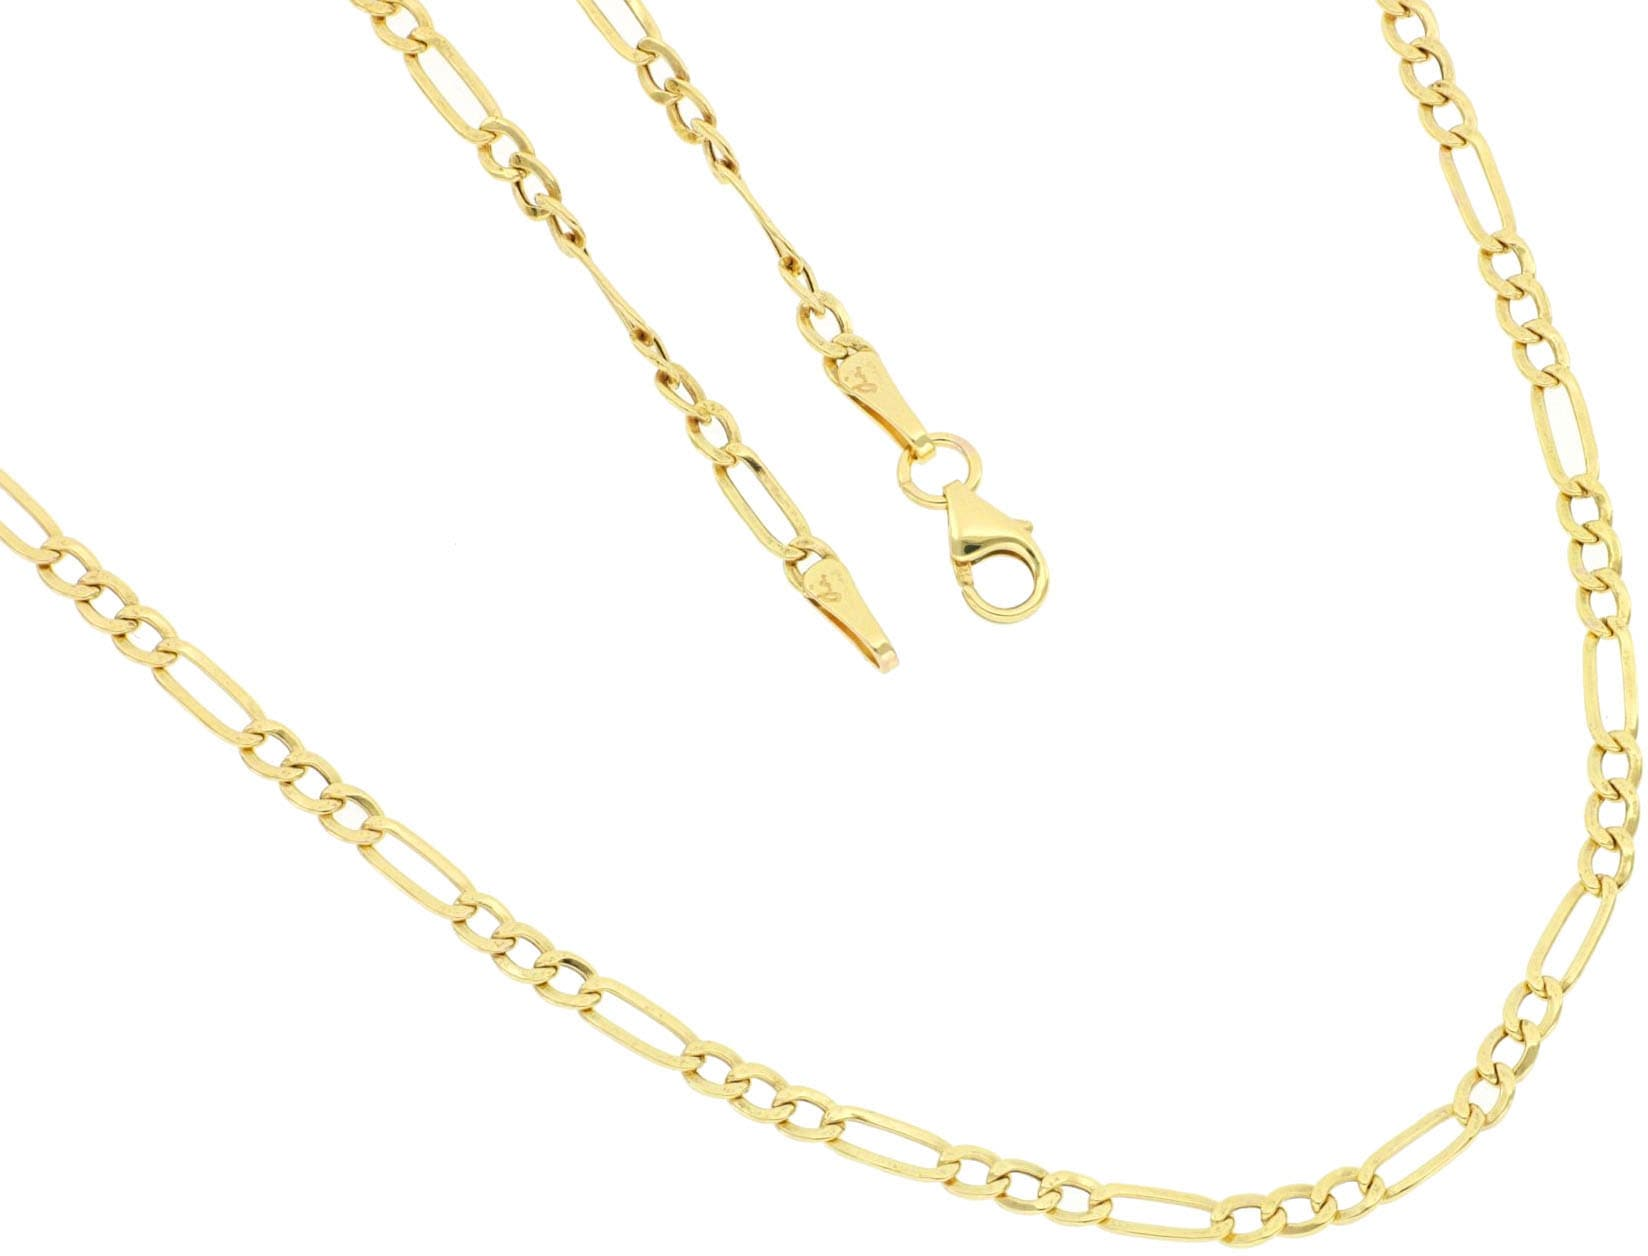 Firetti Goldkette »in Figarokettengliederung, 2-fach diamantiert, poliert, ca. 2,5 mm breit«   Schmuck > Halsketten > Goldketten   Firetti